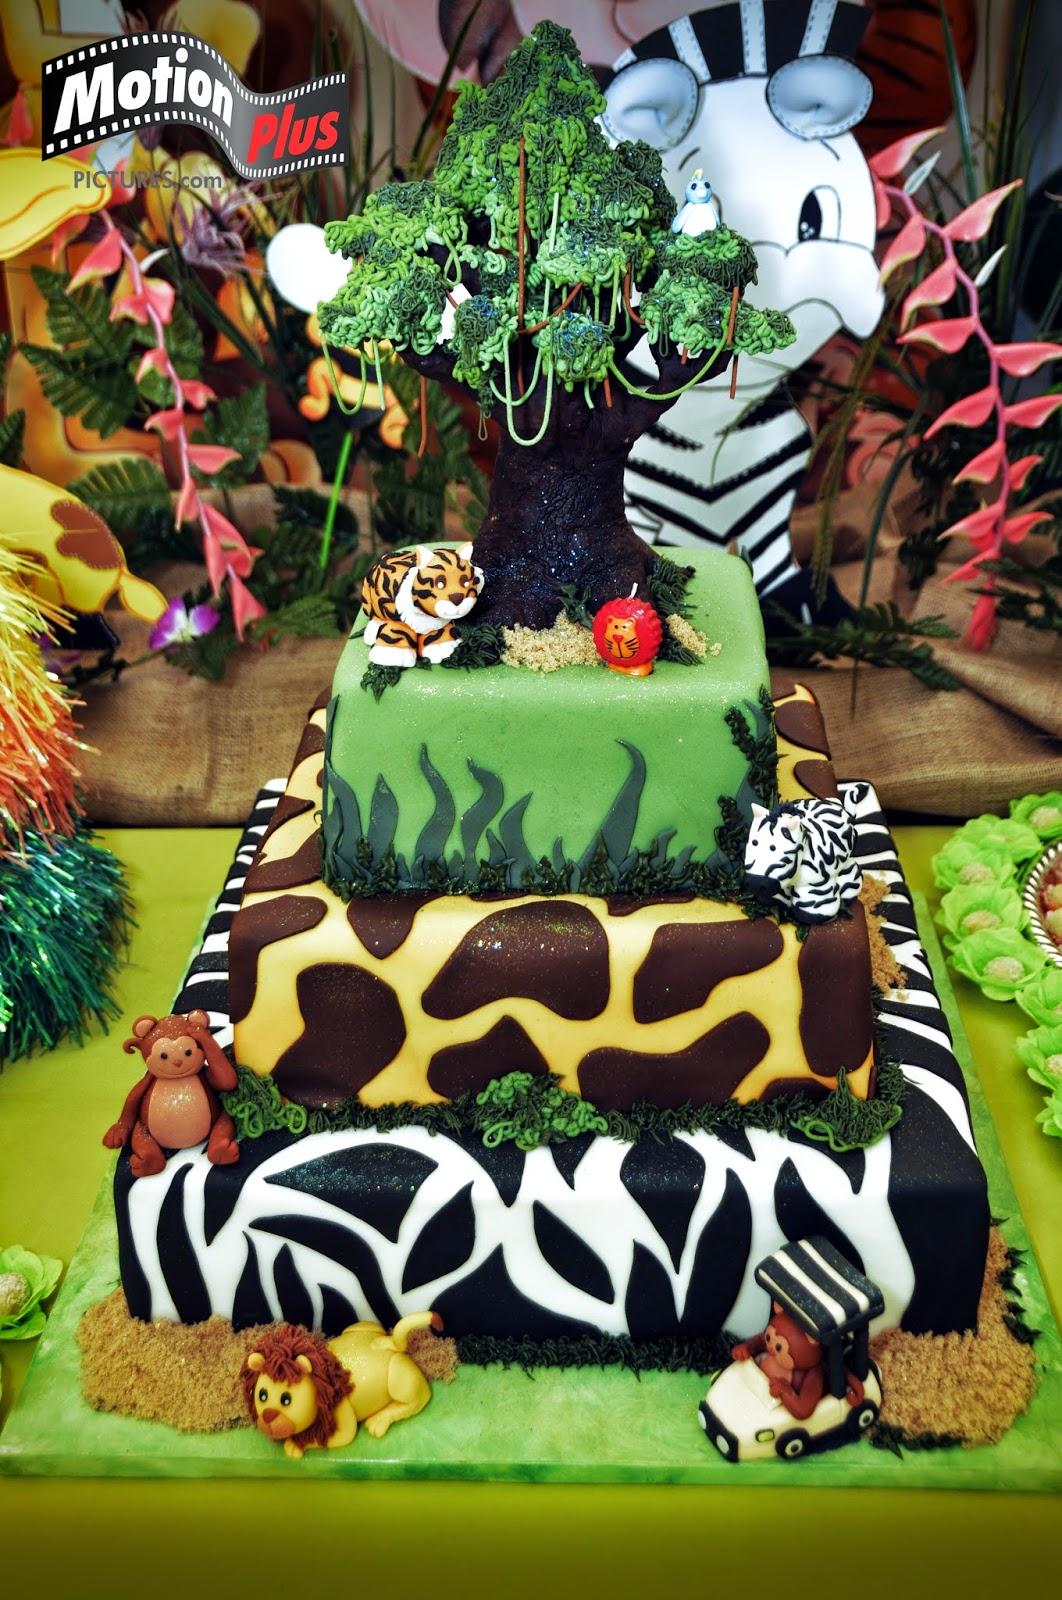 Motion Plus Pictures Safari Themed Birthday Party Diy Ideas